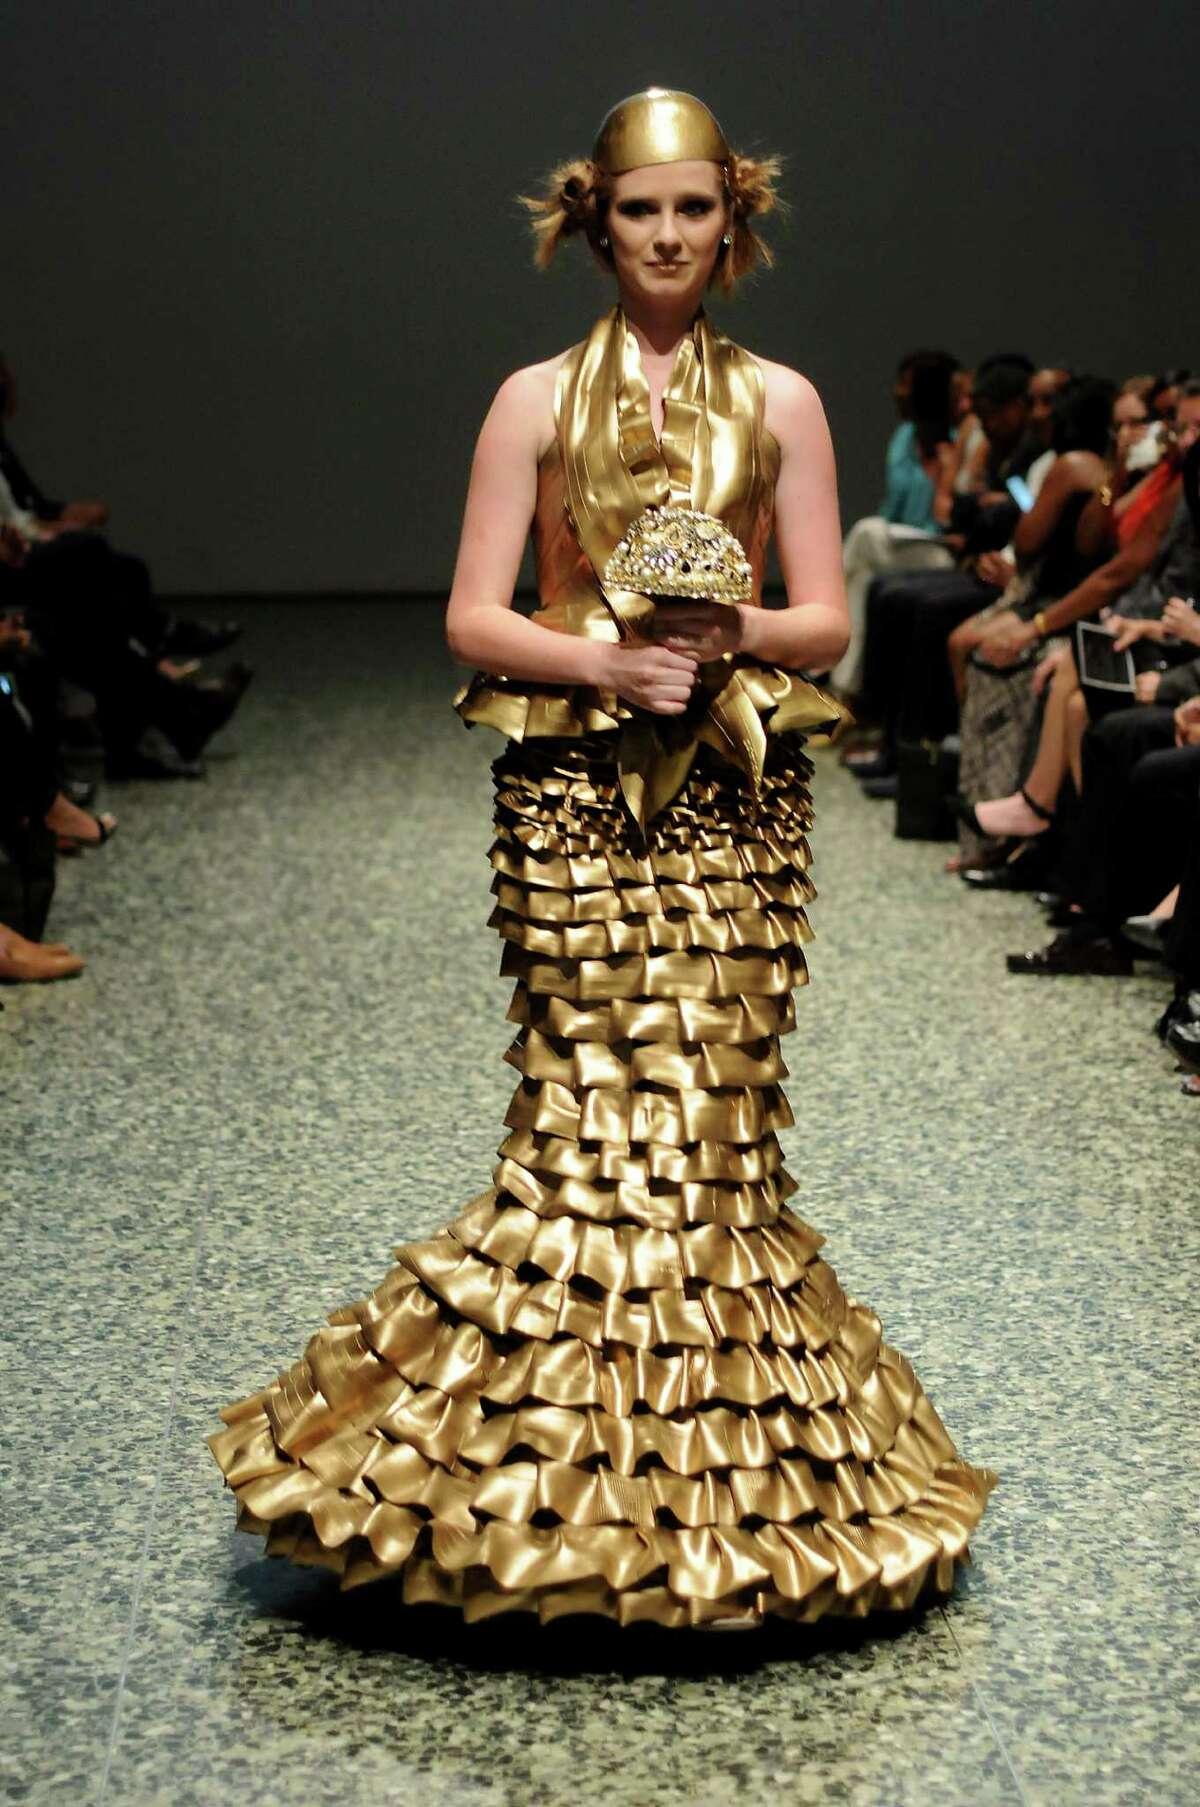 Luisa Nadarajah designed this dress from bicycle tubes.